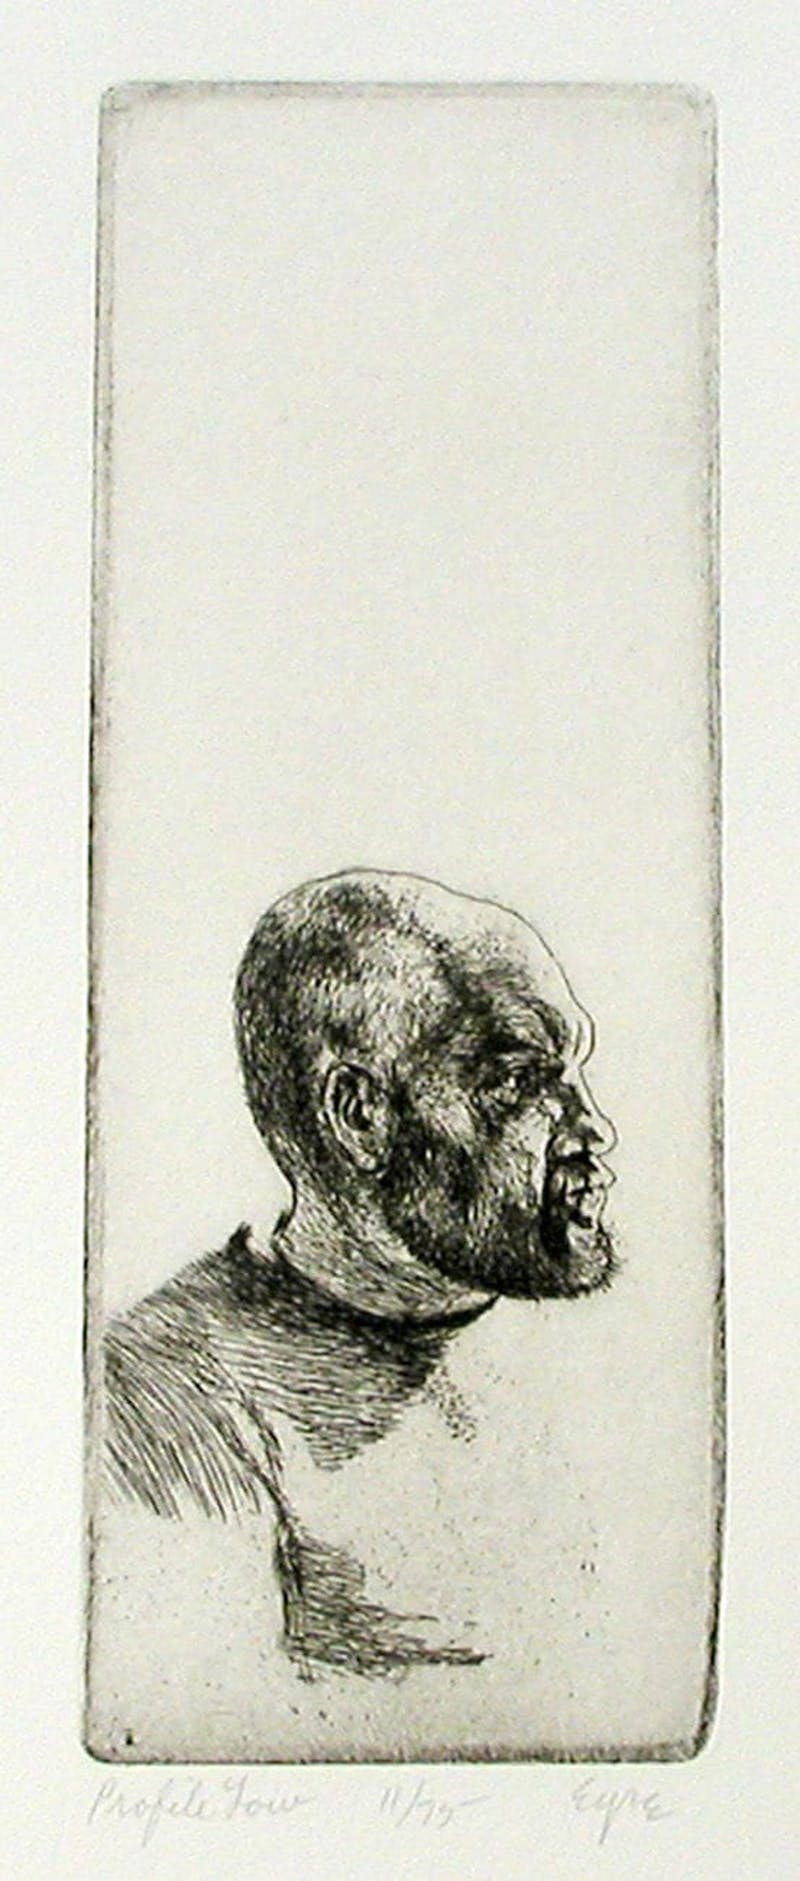 Profile, Low 11/75 Image 1